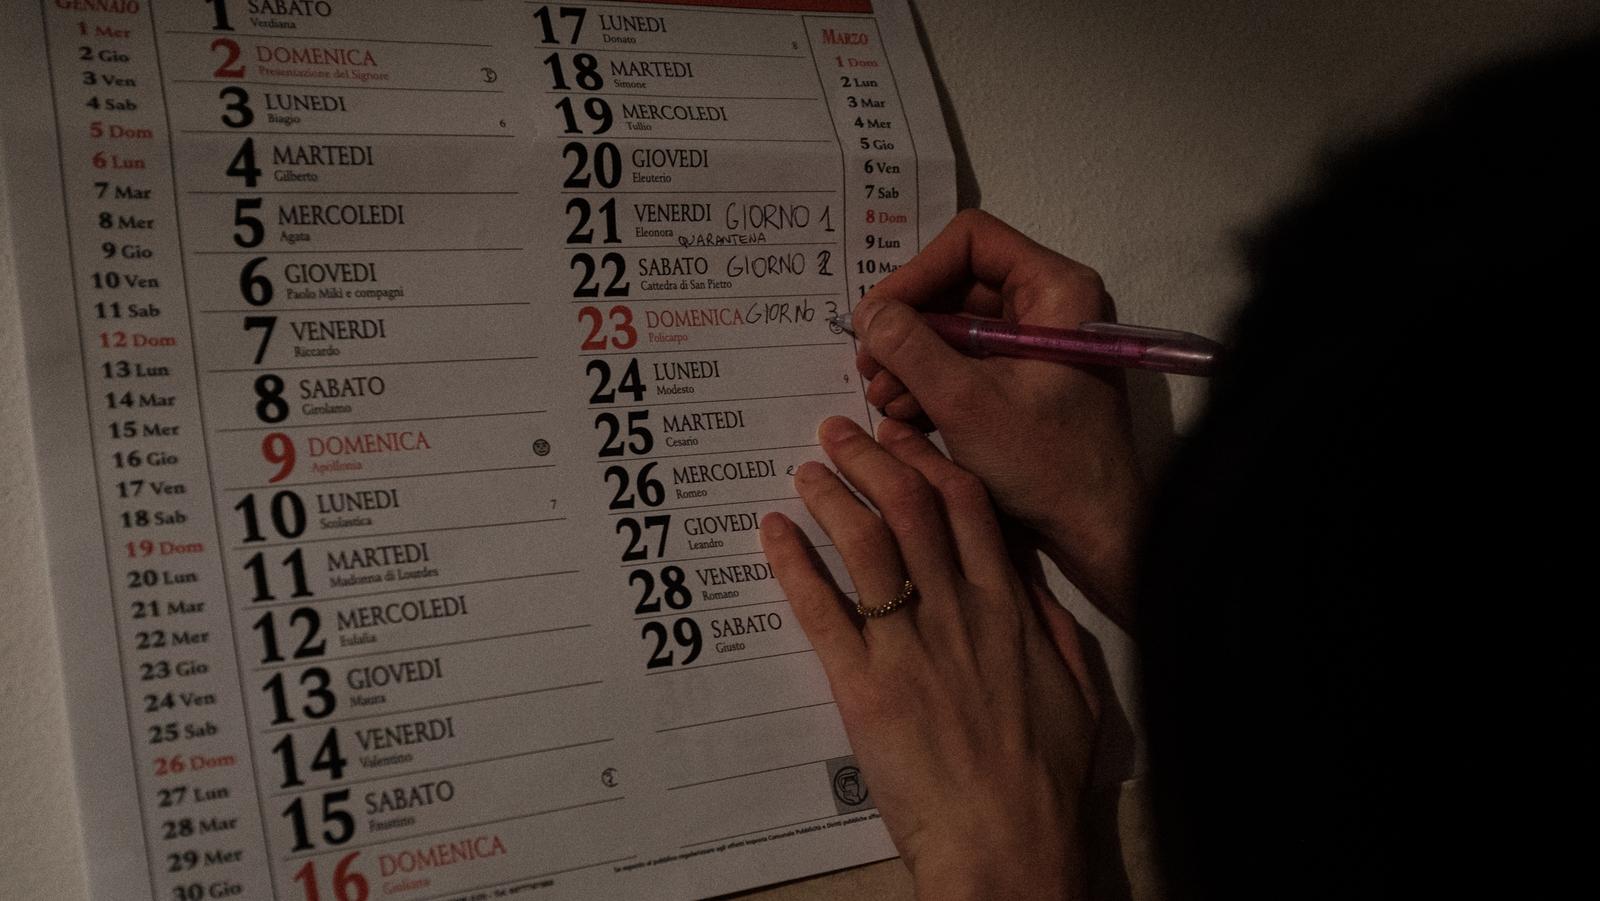 Image - Marking the days of lockdown (Image: Marzio Toniolo)